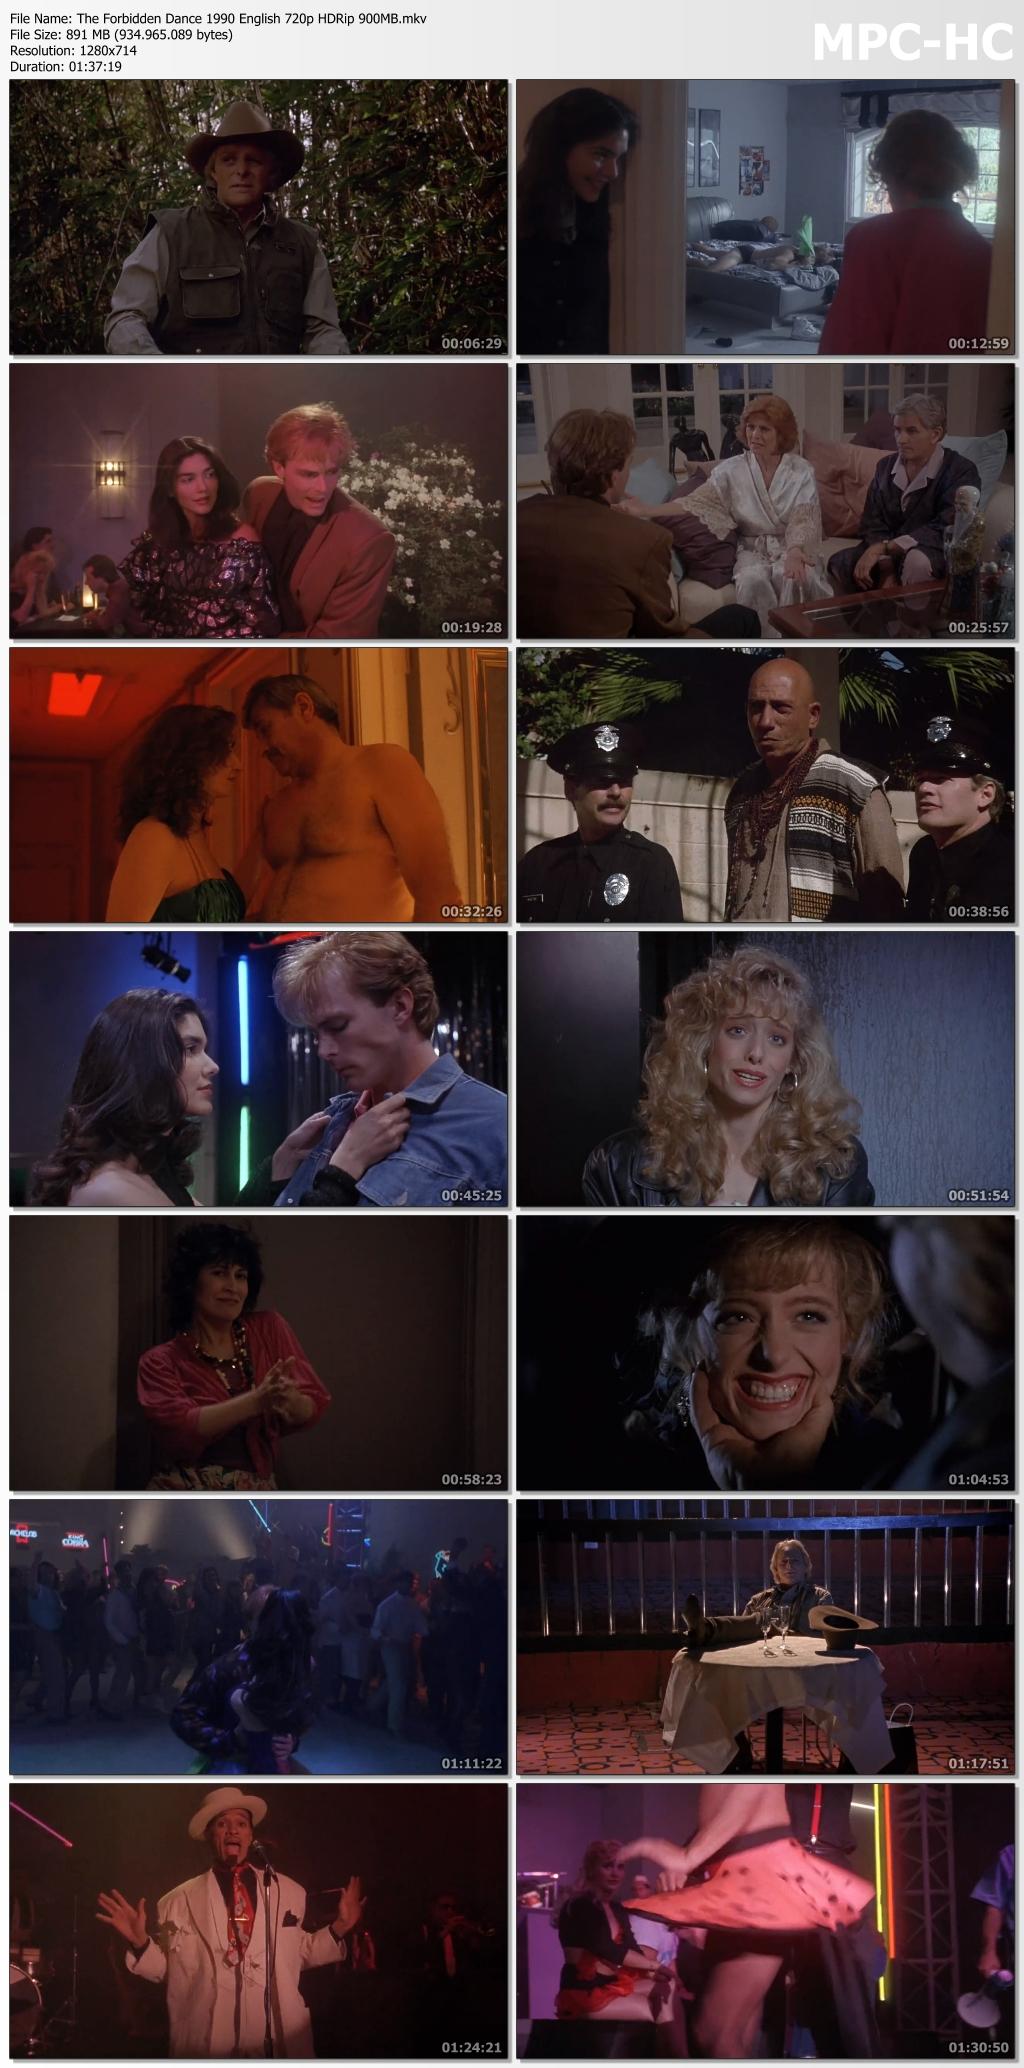 The-Forbidden-Dance-1990-English-720p-HDRip-900-MB-mkv-thumbs